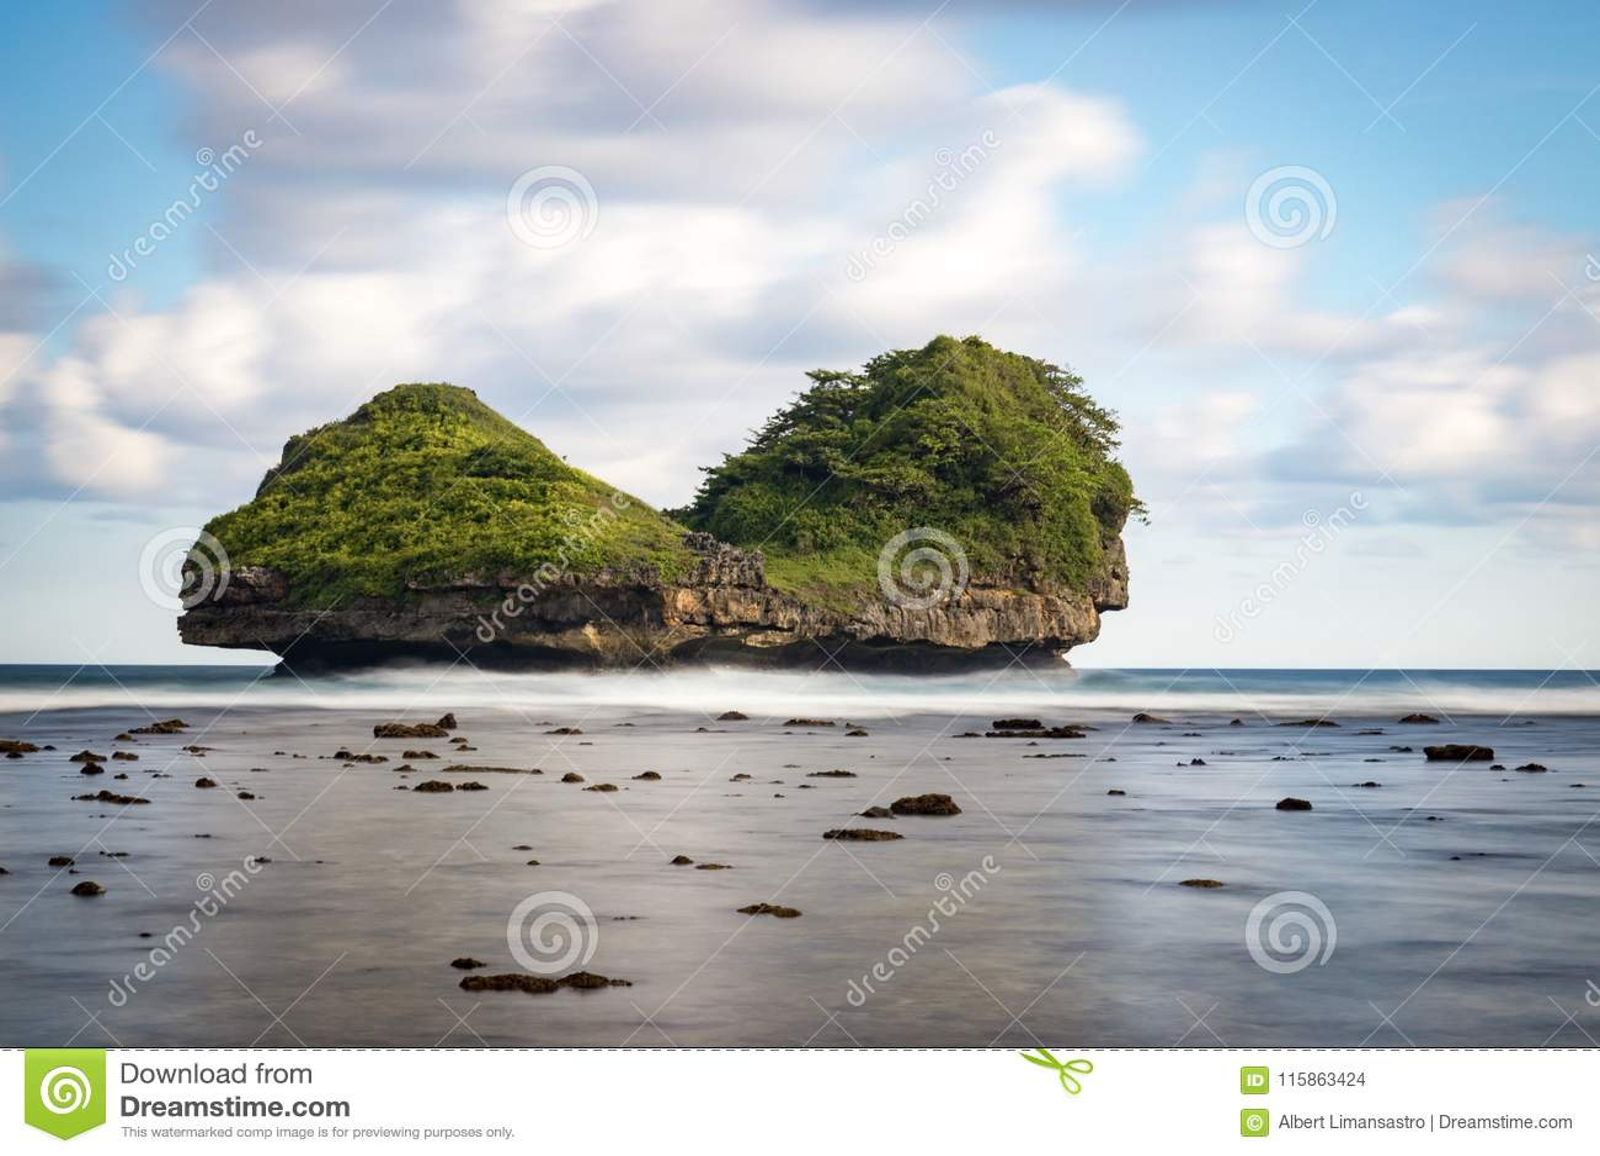 Goa Cina Beach Malang Indonesia Stock Photo Image Of Traveling Malang 115863424